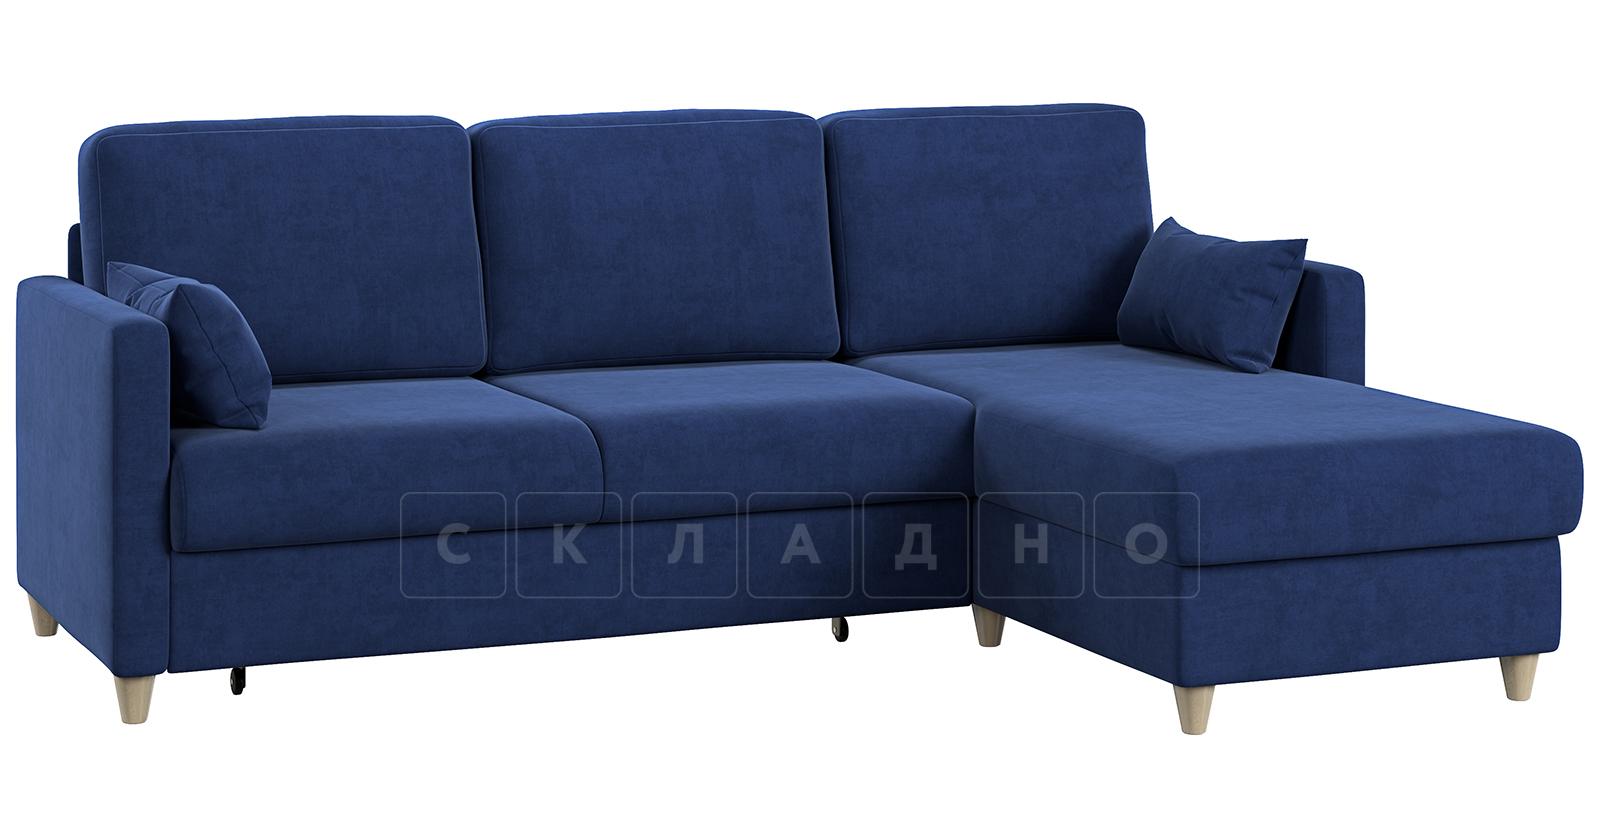 Угловой диван Дарвин темно-синий фото 16 | интернет-магазин Складно